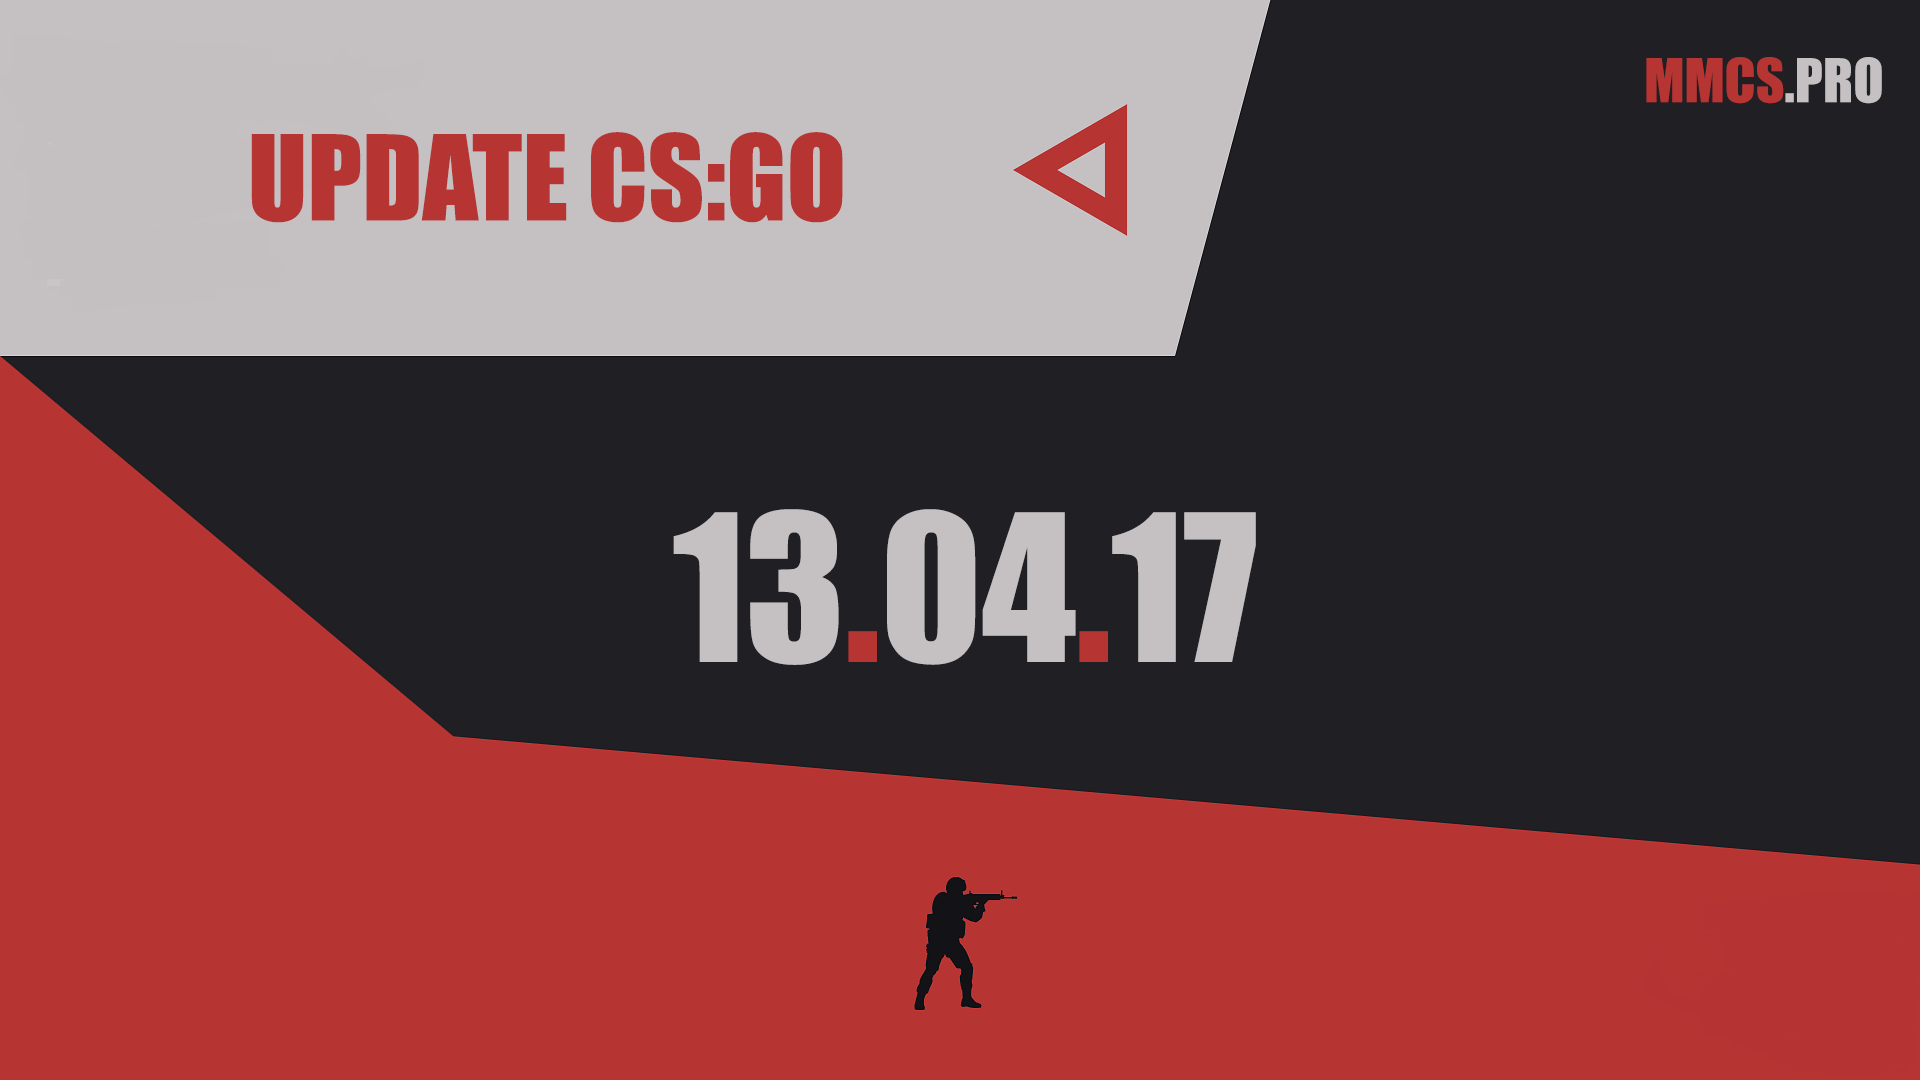 https://mmcs.pro/update-csgo-13-04-2017-valve/